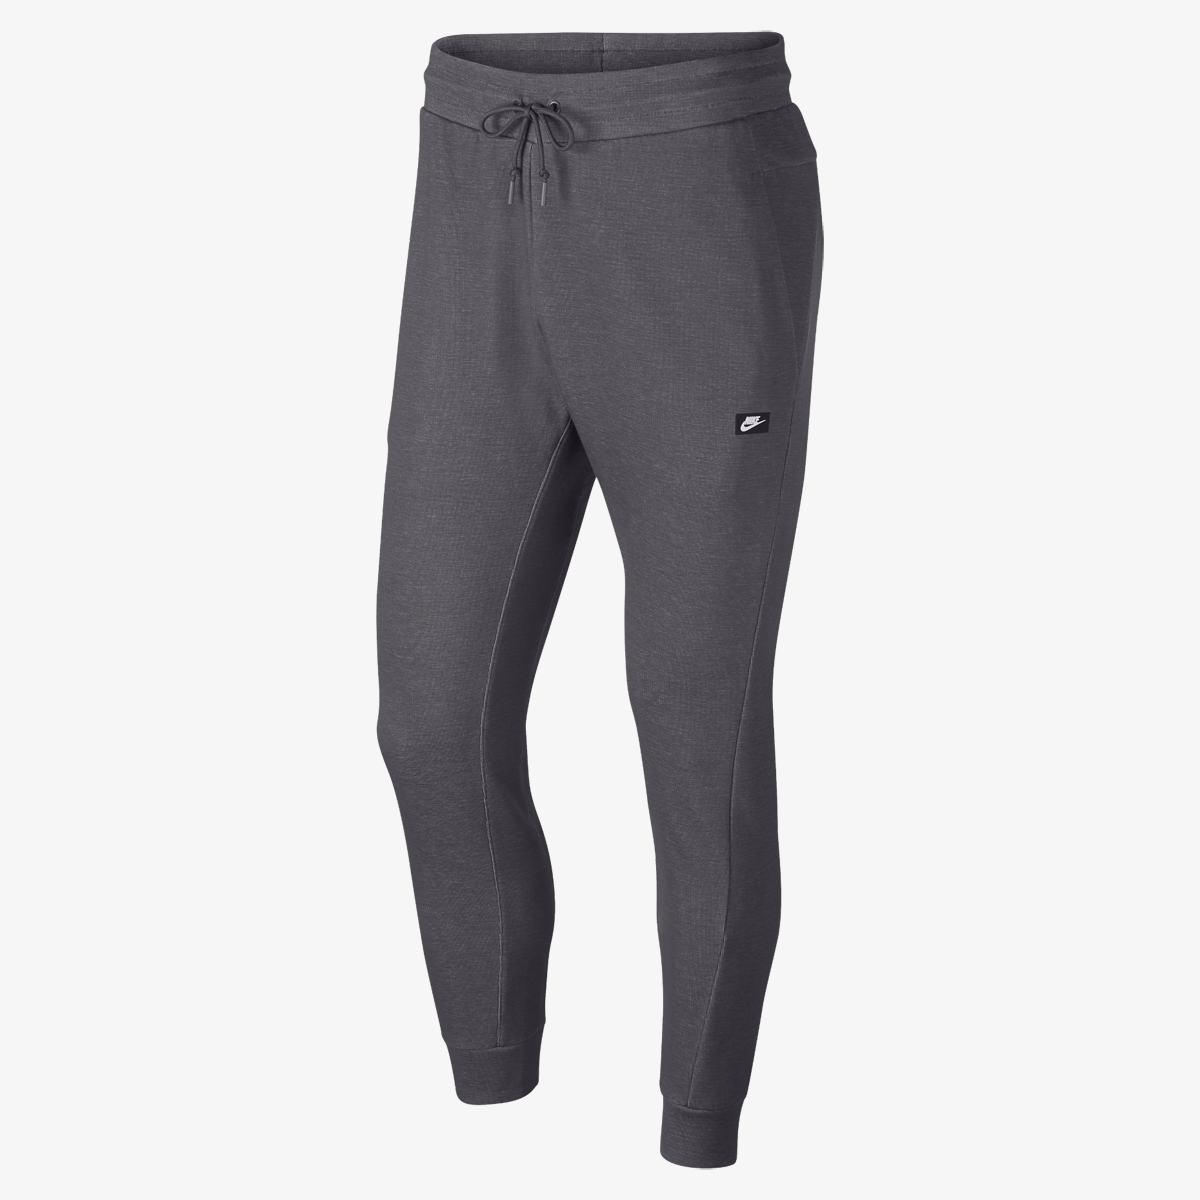 e076a59b Штаны Nike Nsw Optilc Jggr 928493-021 (Оригинал) - Football Mall -  футбольный